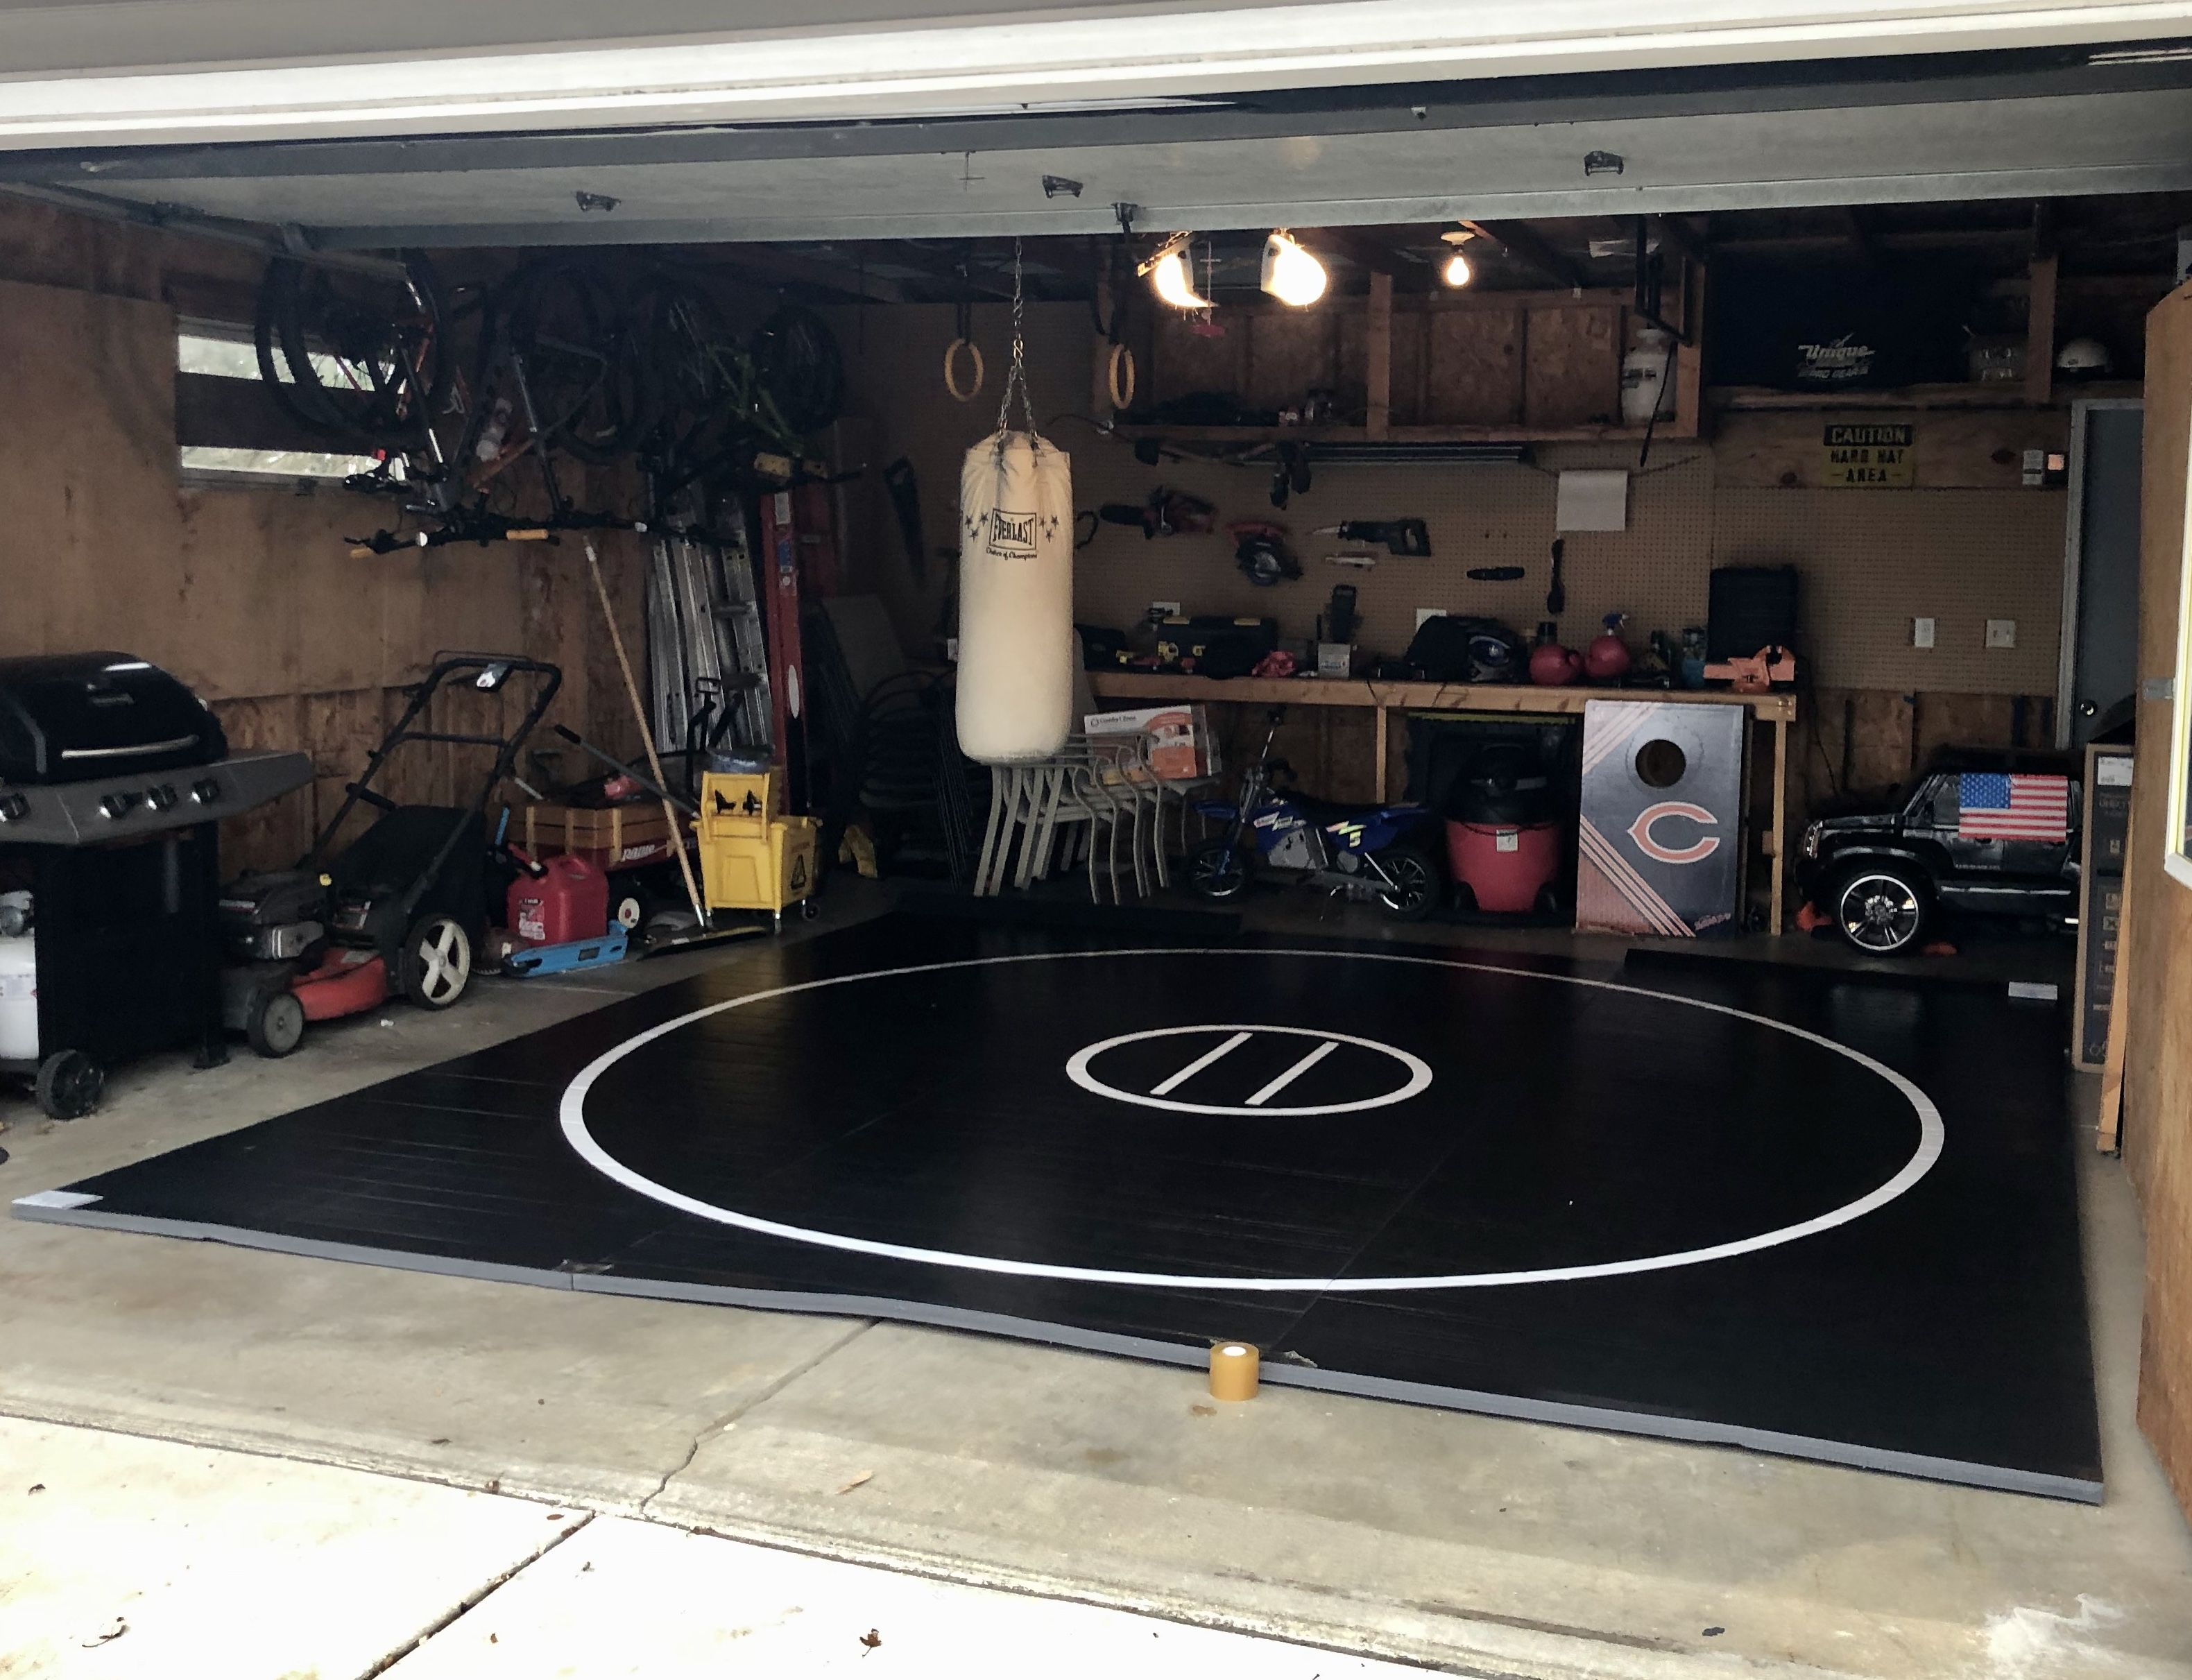 12 X 12 X 1 3 8 Roll Up Wrestling Mat In 2020 Wrestling Mat Garage Gym At Home Gym